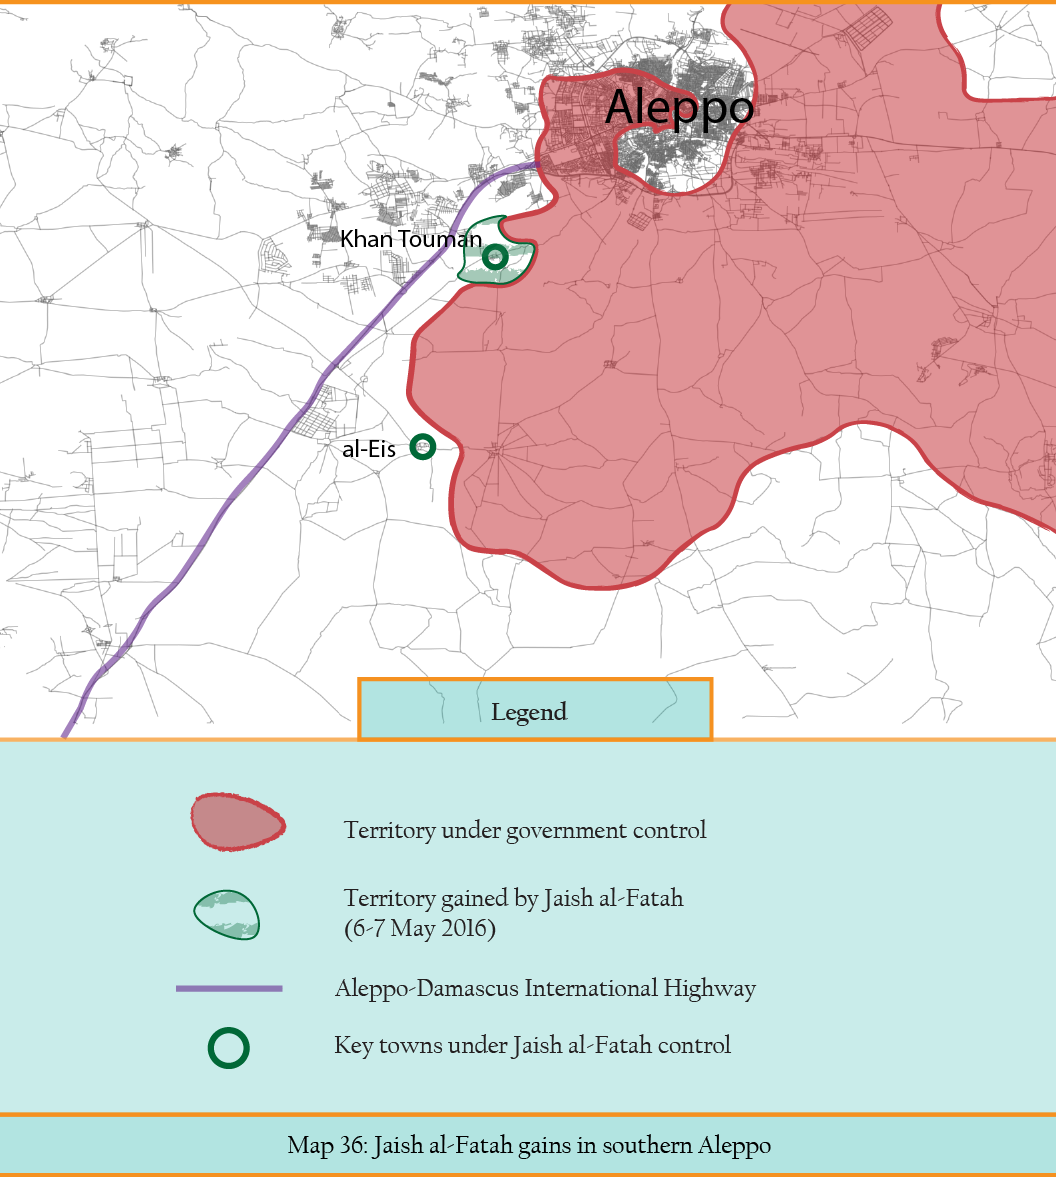 Map 36 - Jaish al-Fatah gains in southern Aleppo